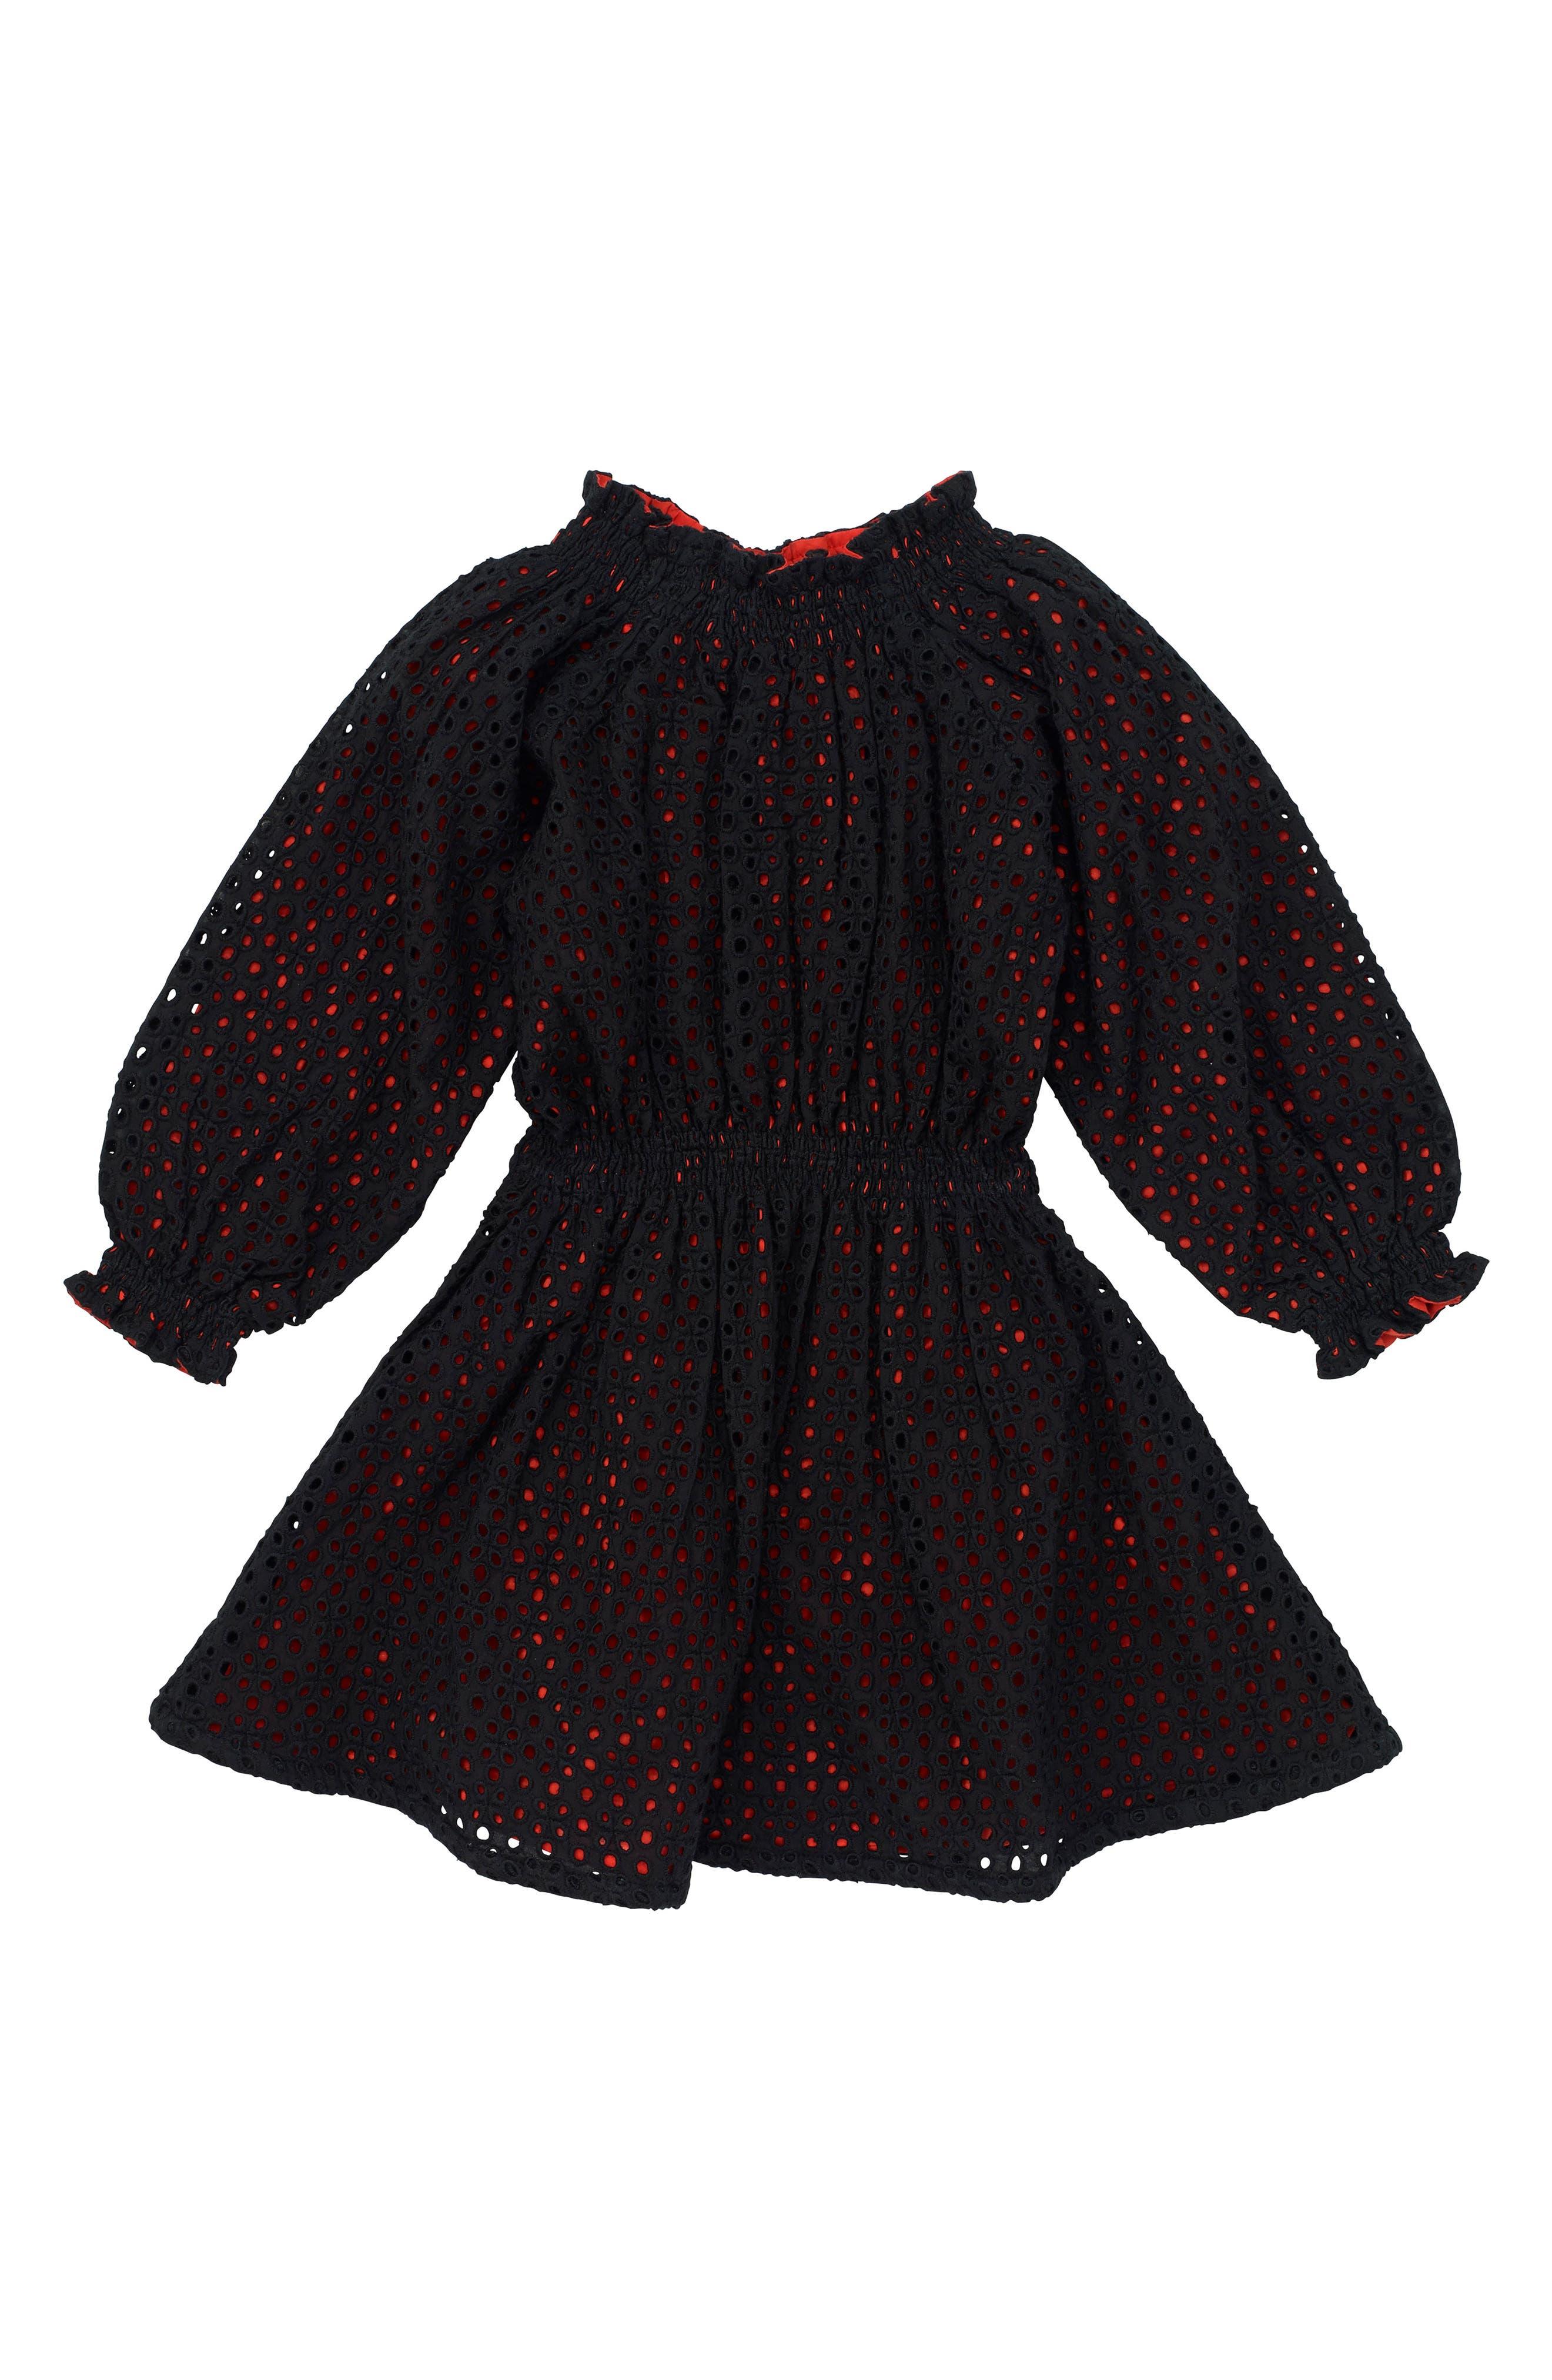 Spellbound Dress,                             Main thumbnail 1, color,                             Black